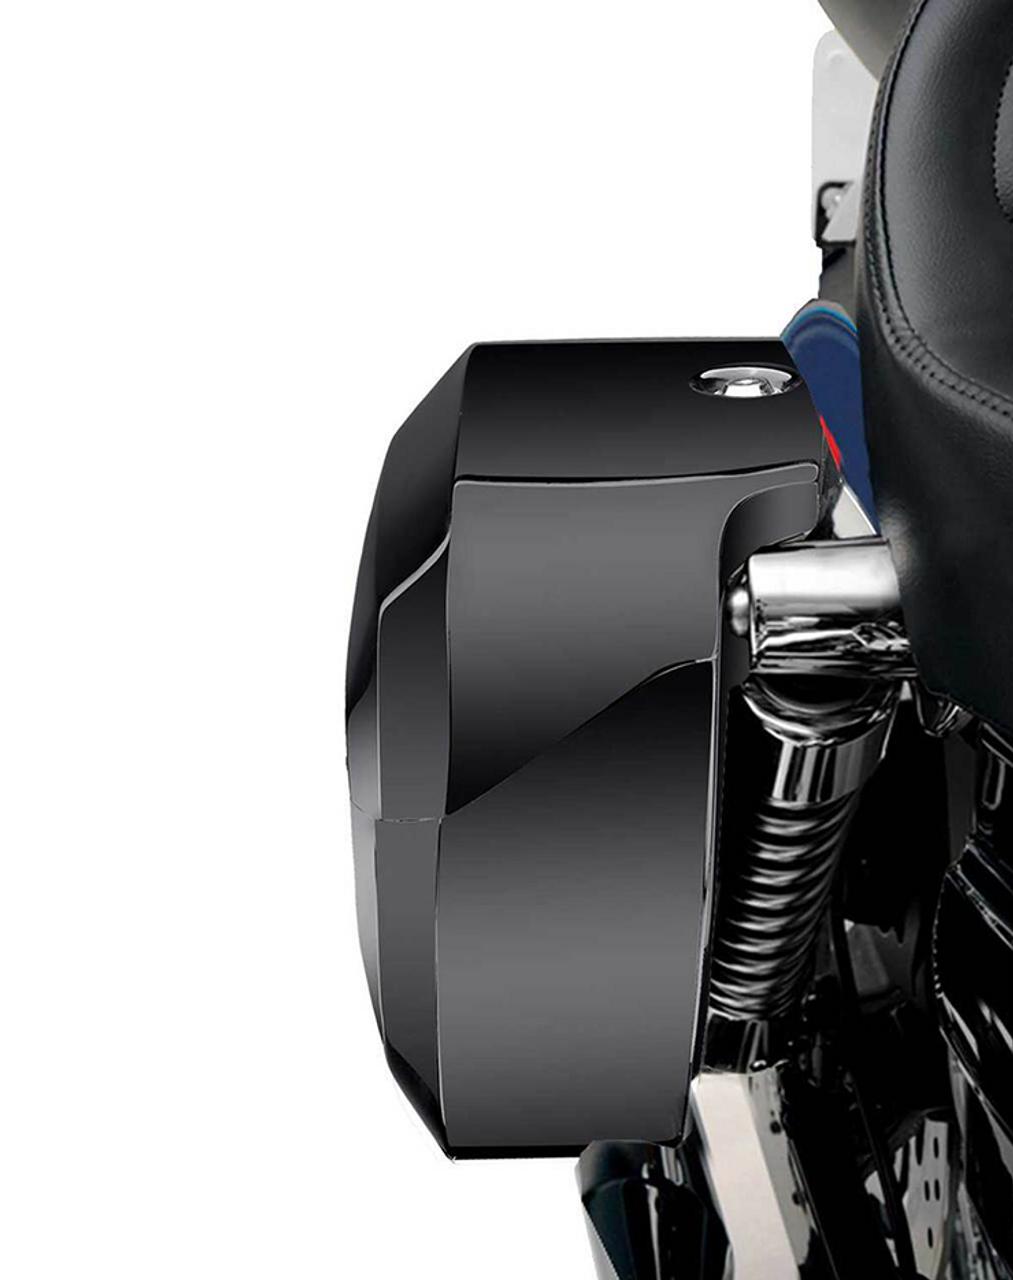 Honda VTX 1800 C Viking Lamellar Large Spear Shock Cutout Hard Saddlebags shock cutout view